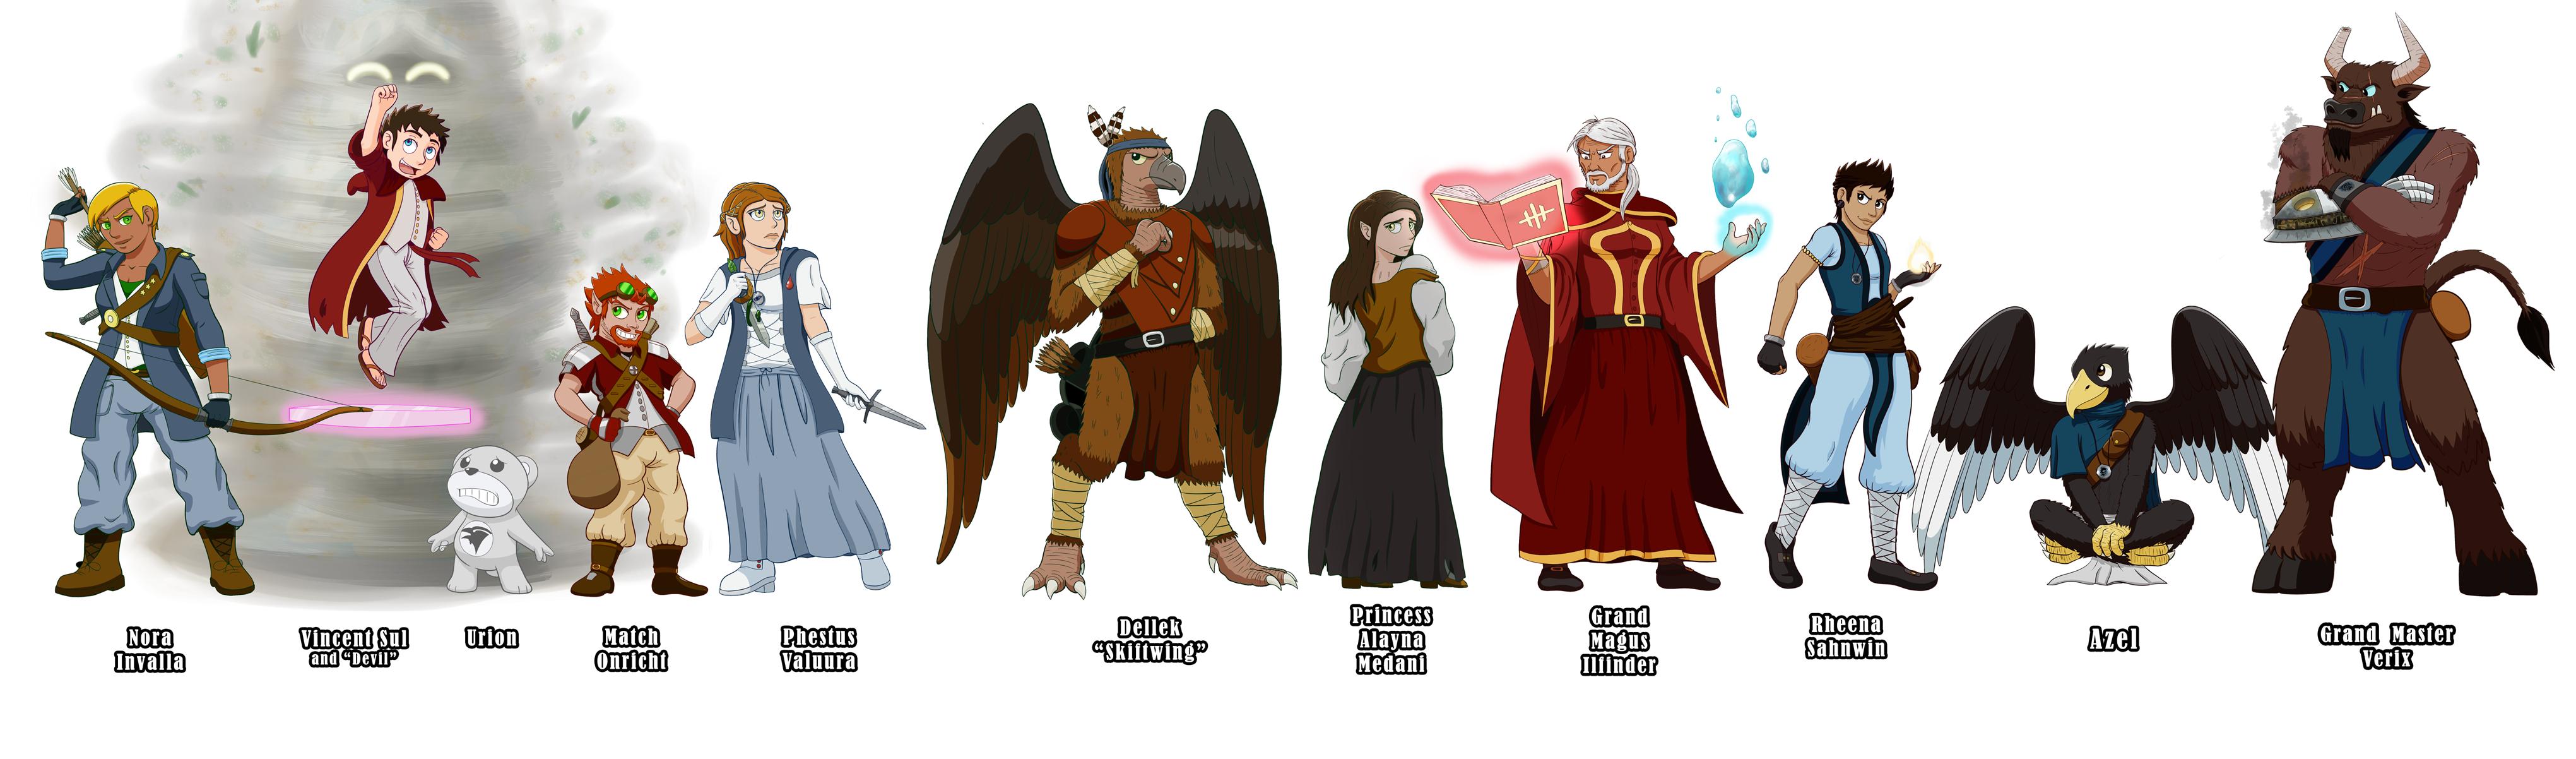 Character Design Challenge 2017 : Character design challenge dnd npcs complete by rasarak